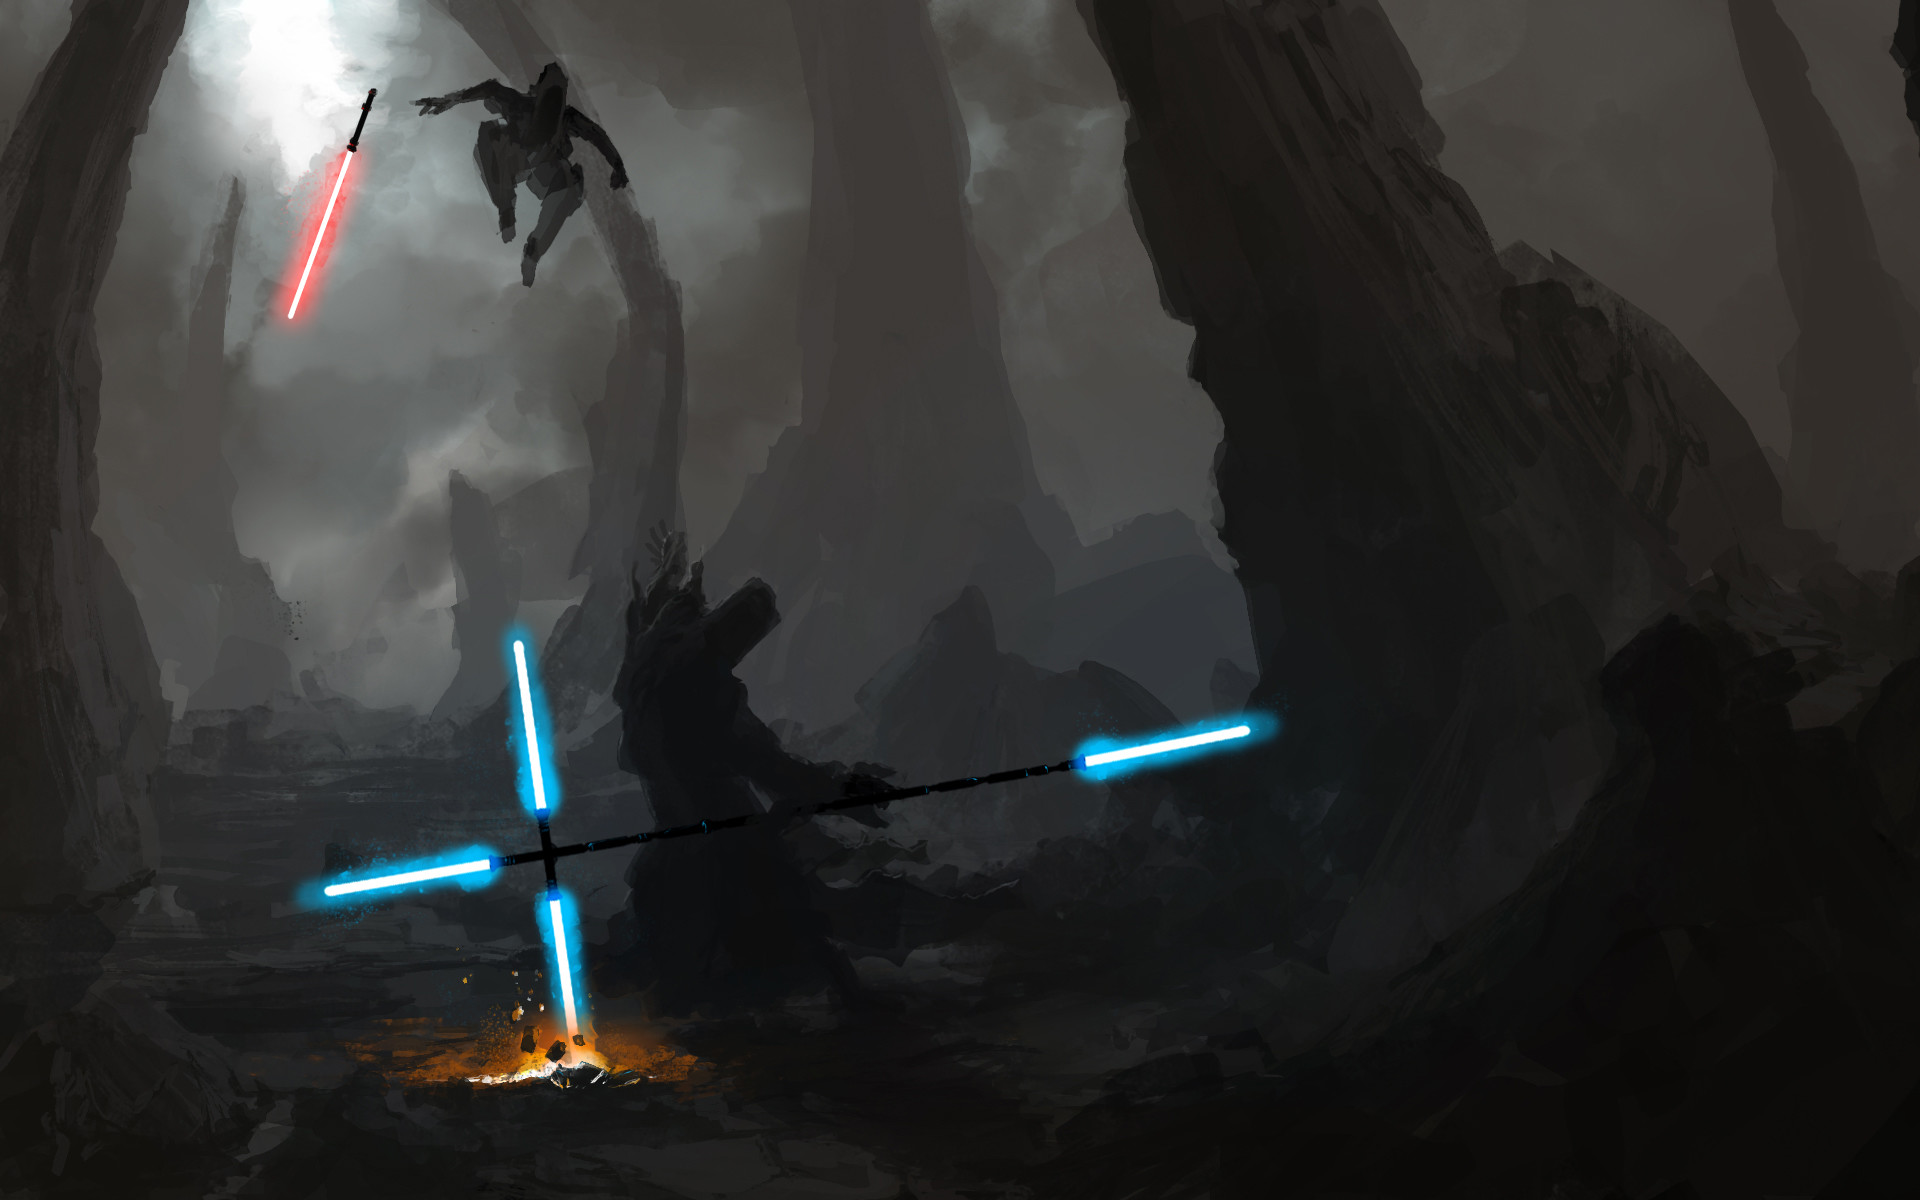 Sith hunter cross crucifix 4 lightsaber jedi Star Wars wallpapers